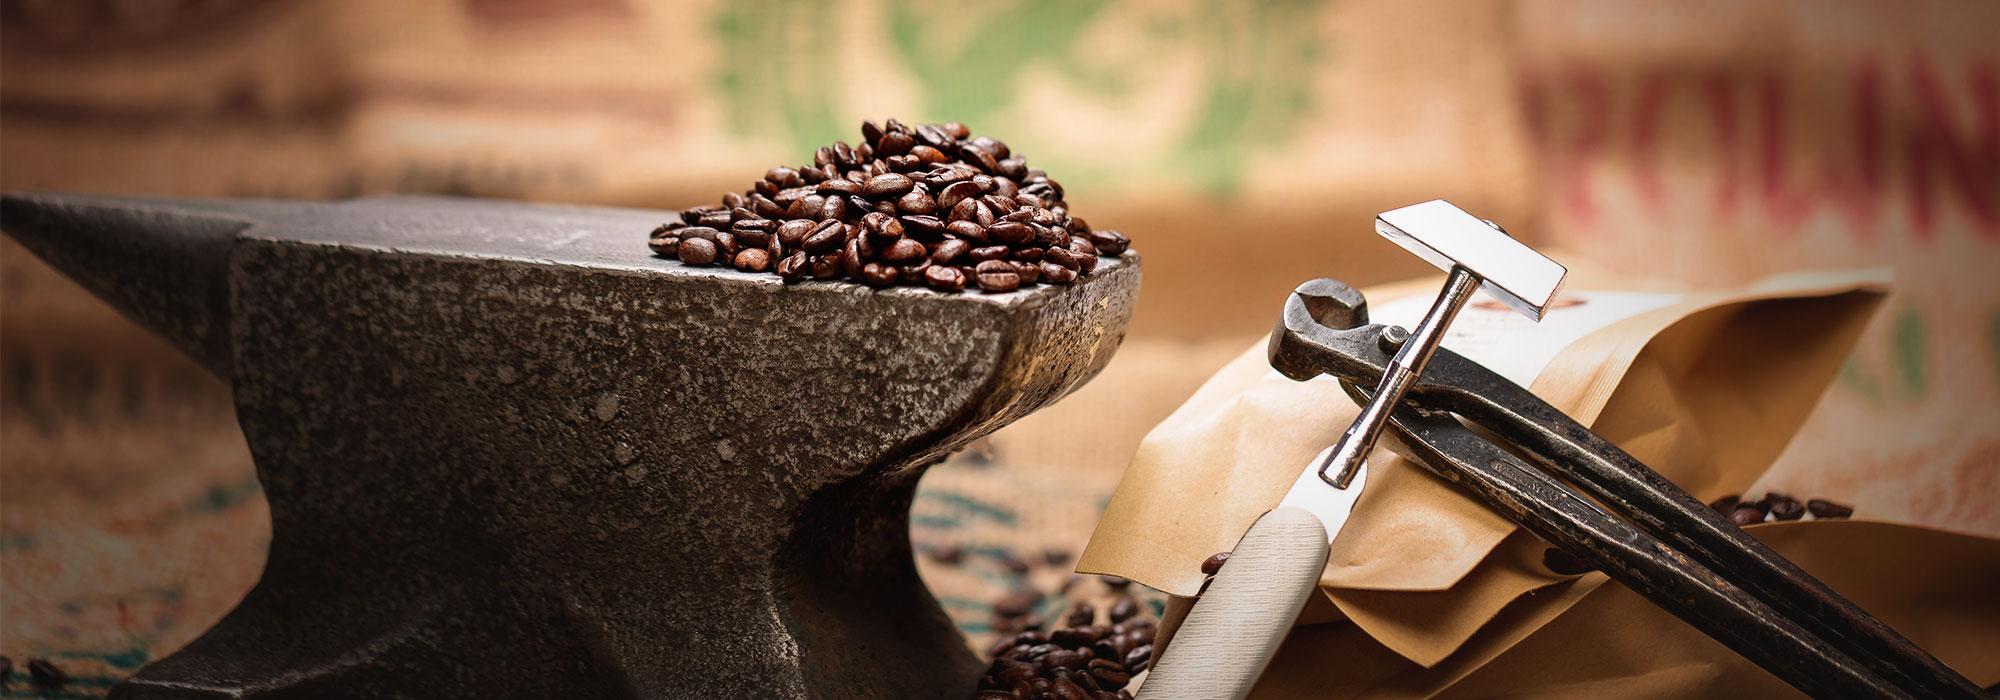 Kaffee Rösterei Bohnenschmiede Wehringen